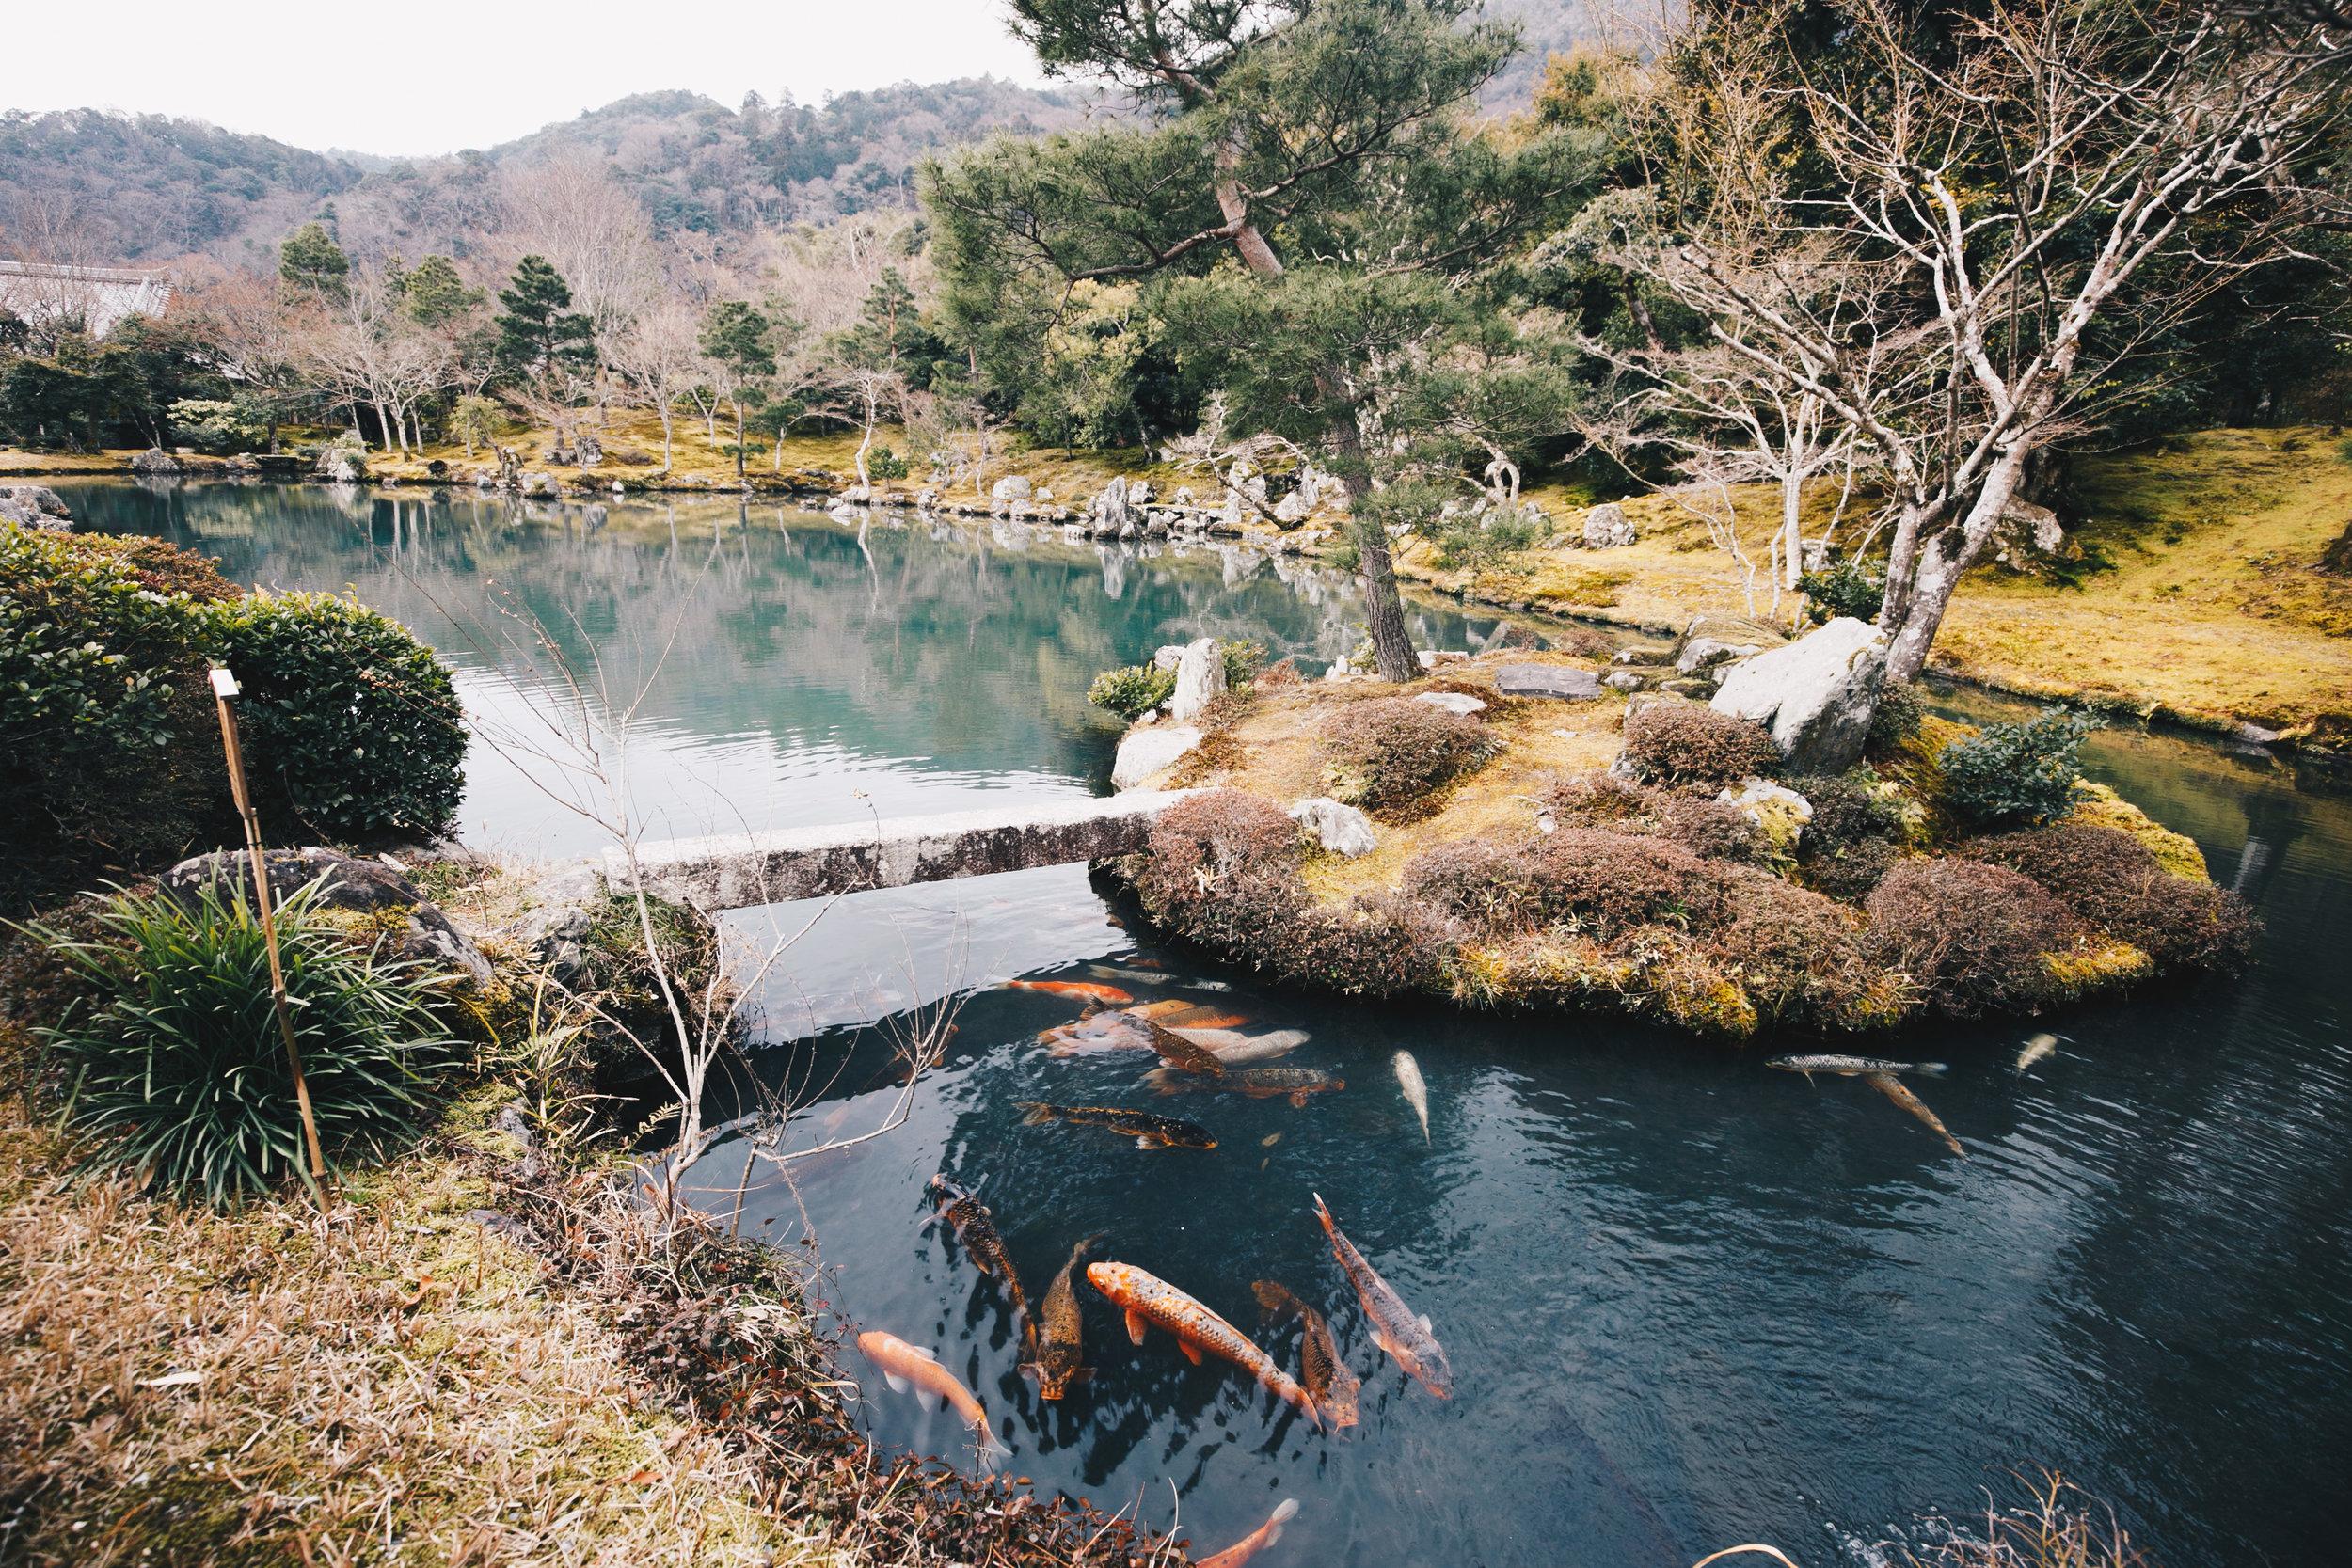 lichipan_PrinceGallery_Takanawa-47.jpg